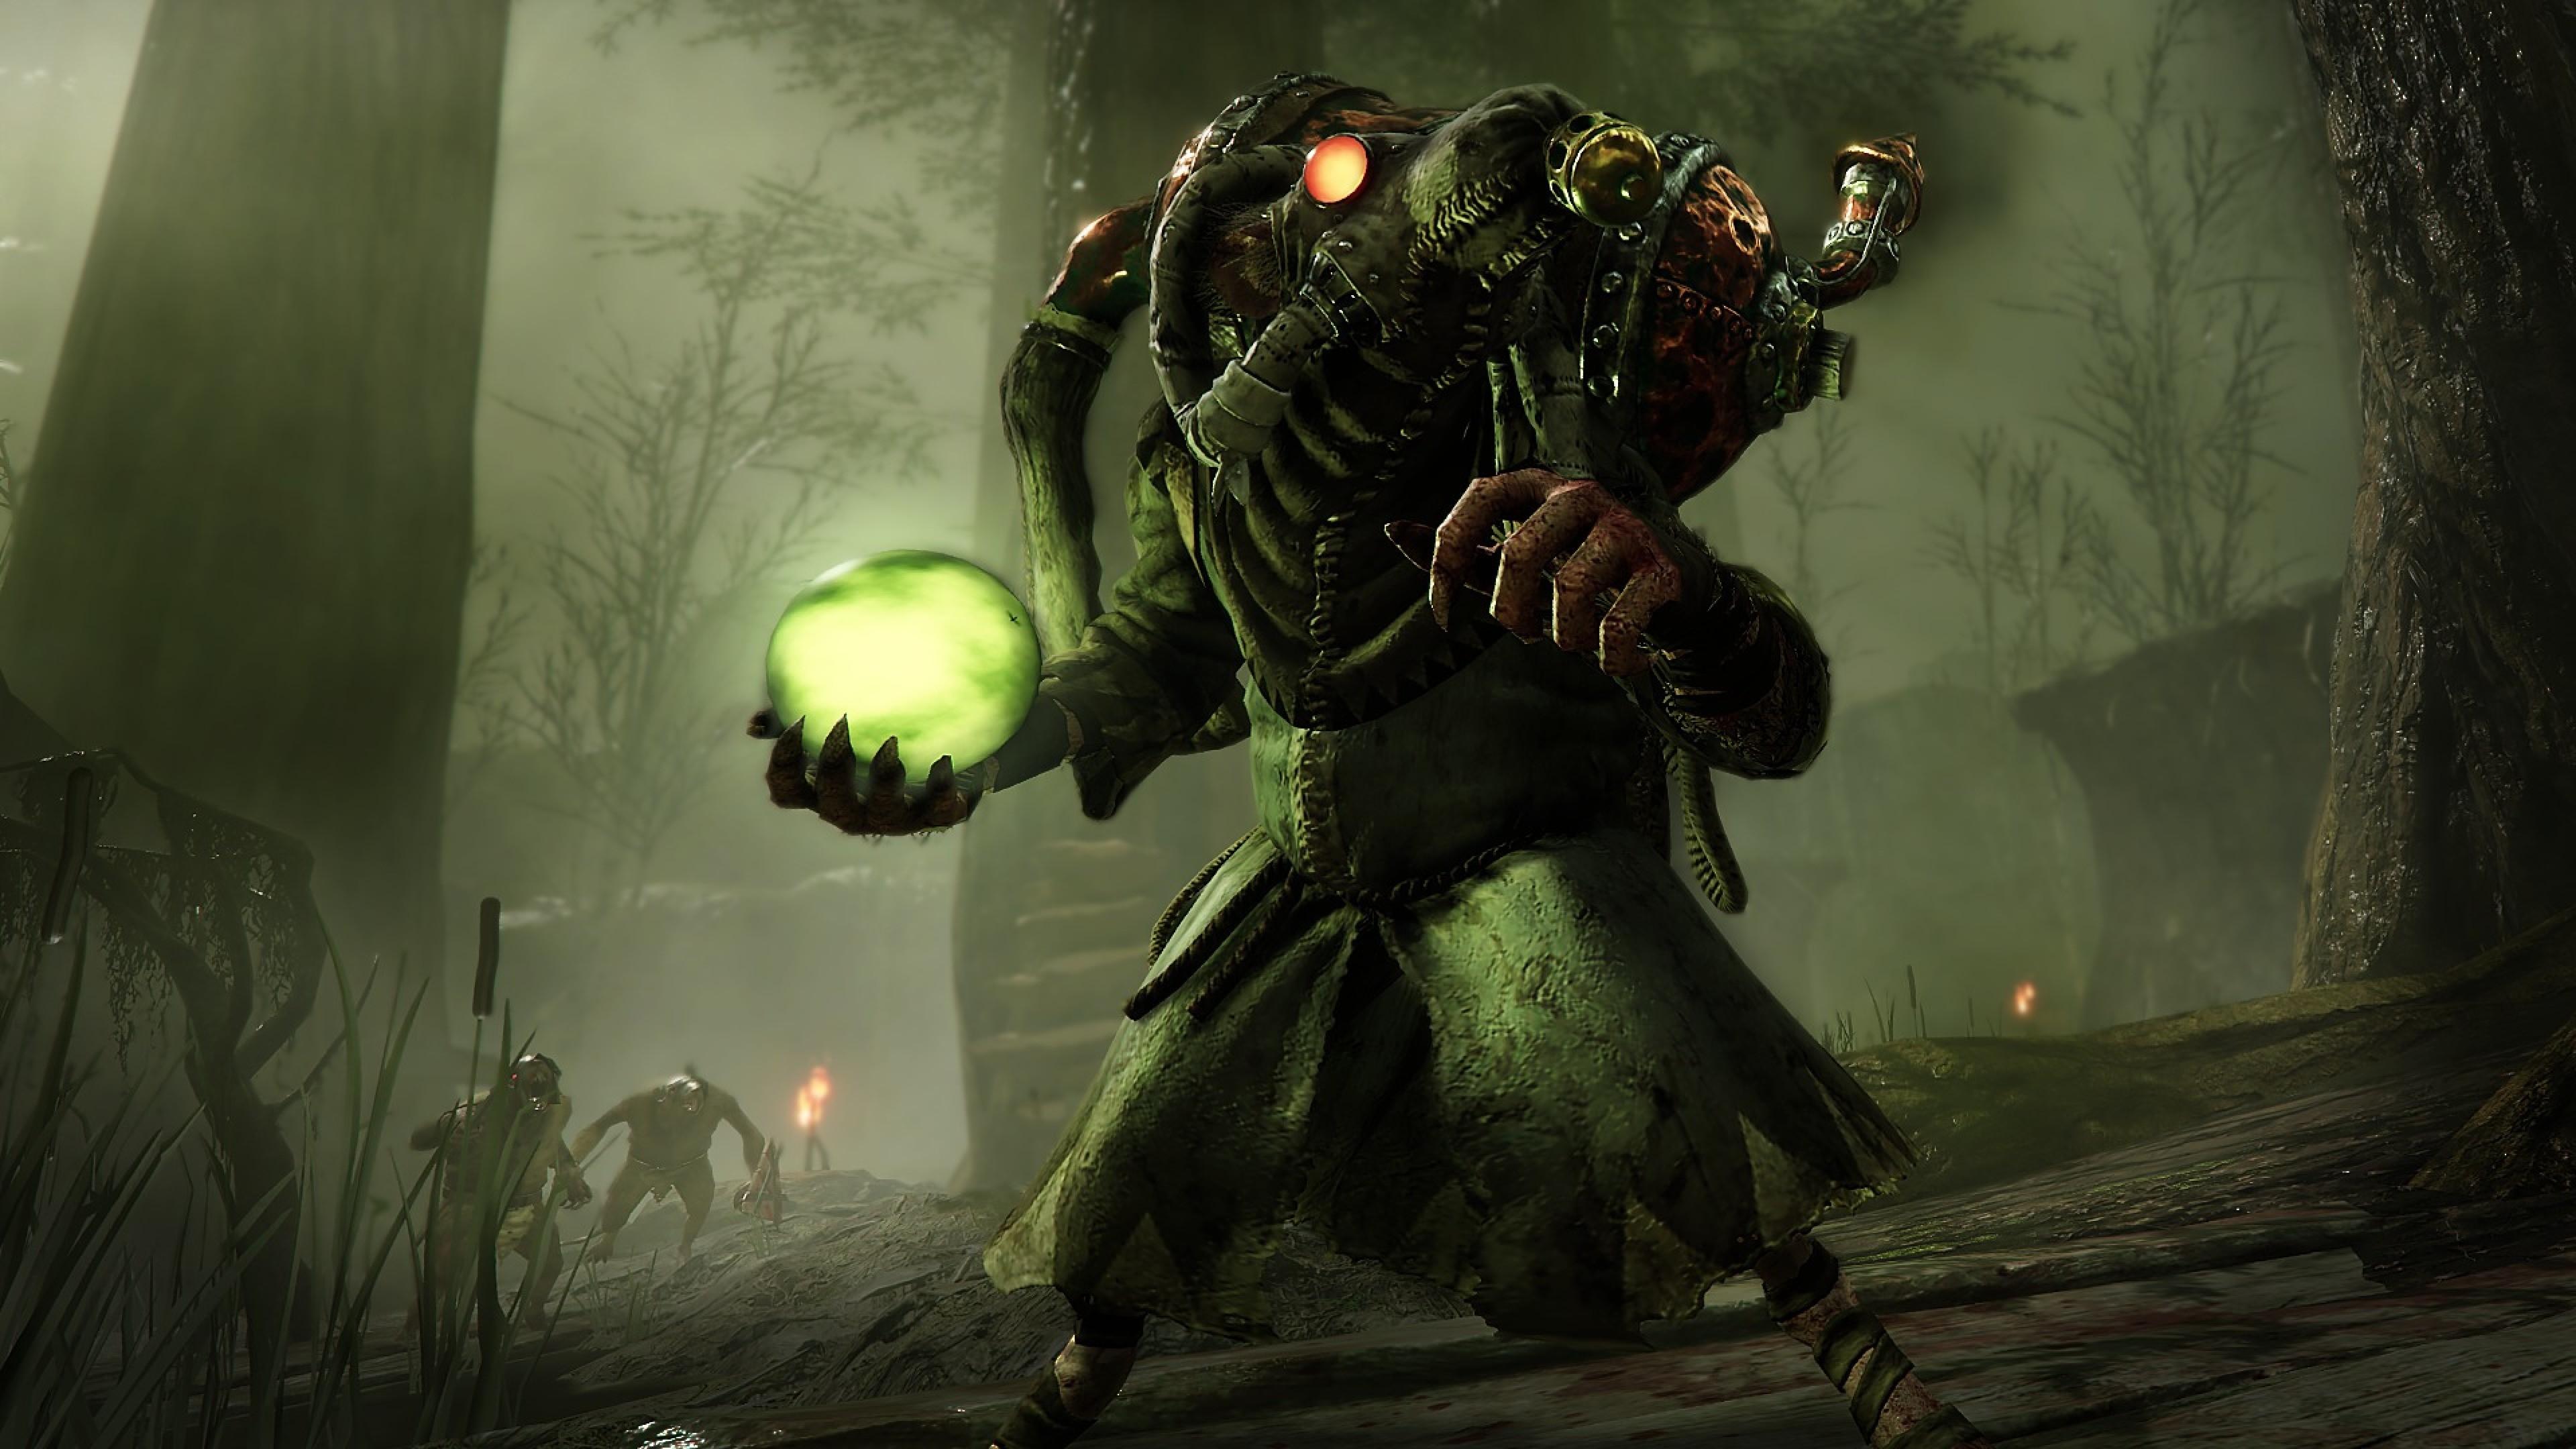 Wallpaper Warhammer Vermintide 2 Screenshot 4k Games